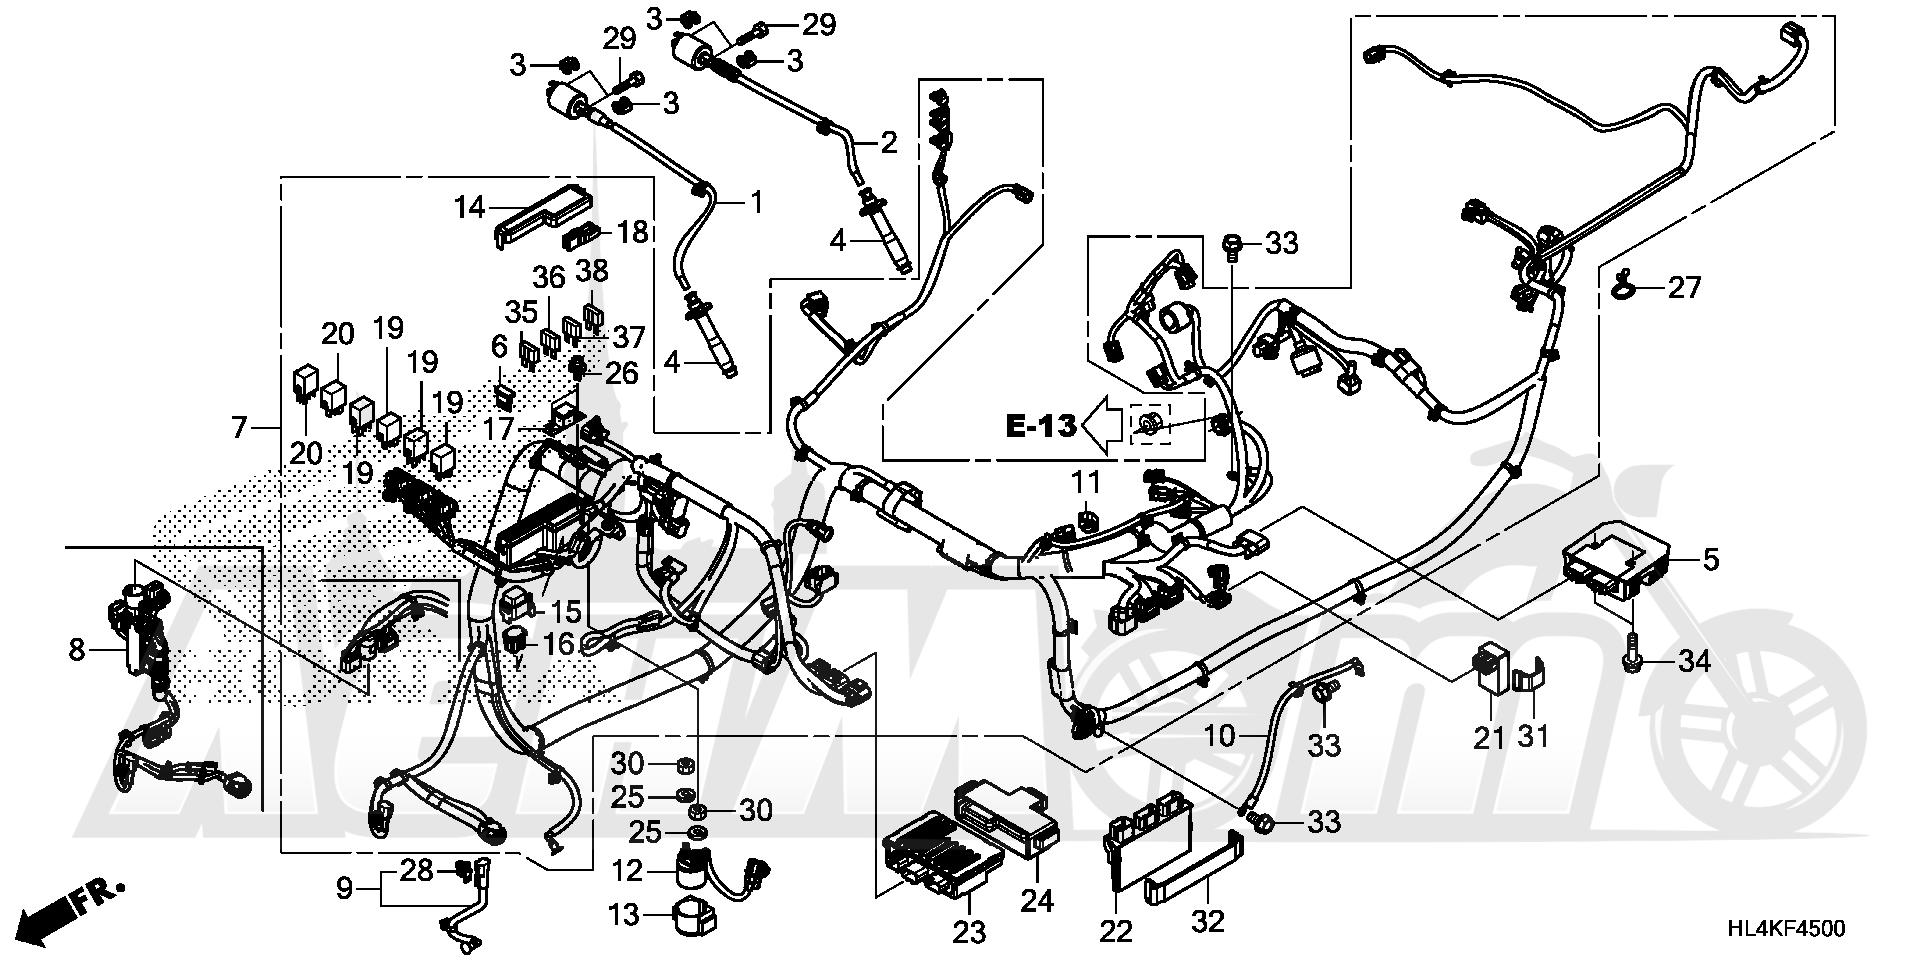 Запчасти для Квадроцикла Honda 2019 SXS1000M3P Раздел: WIRE HARNESS | жгут проводов